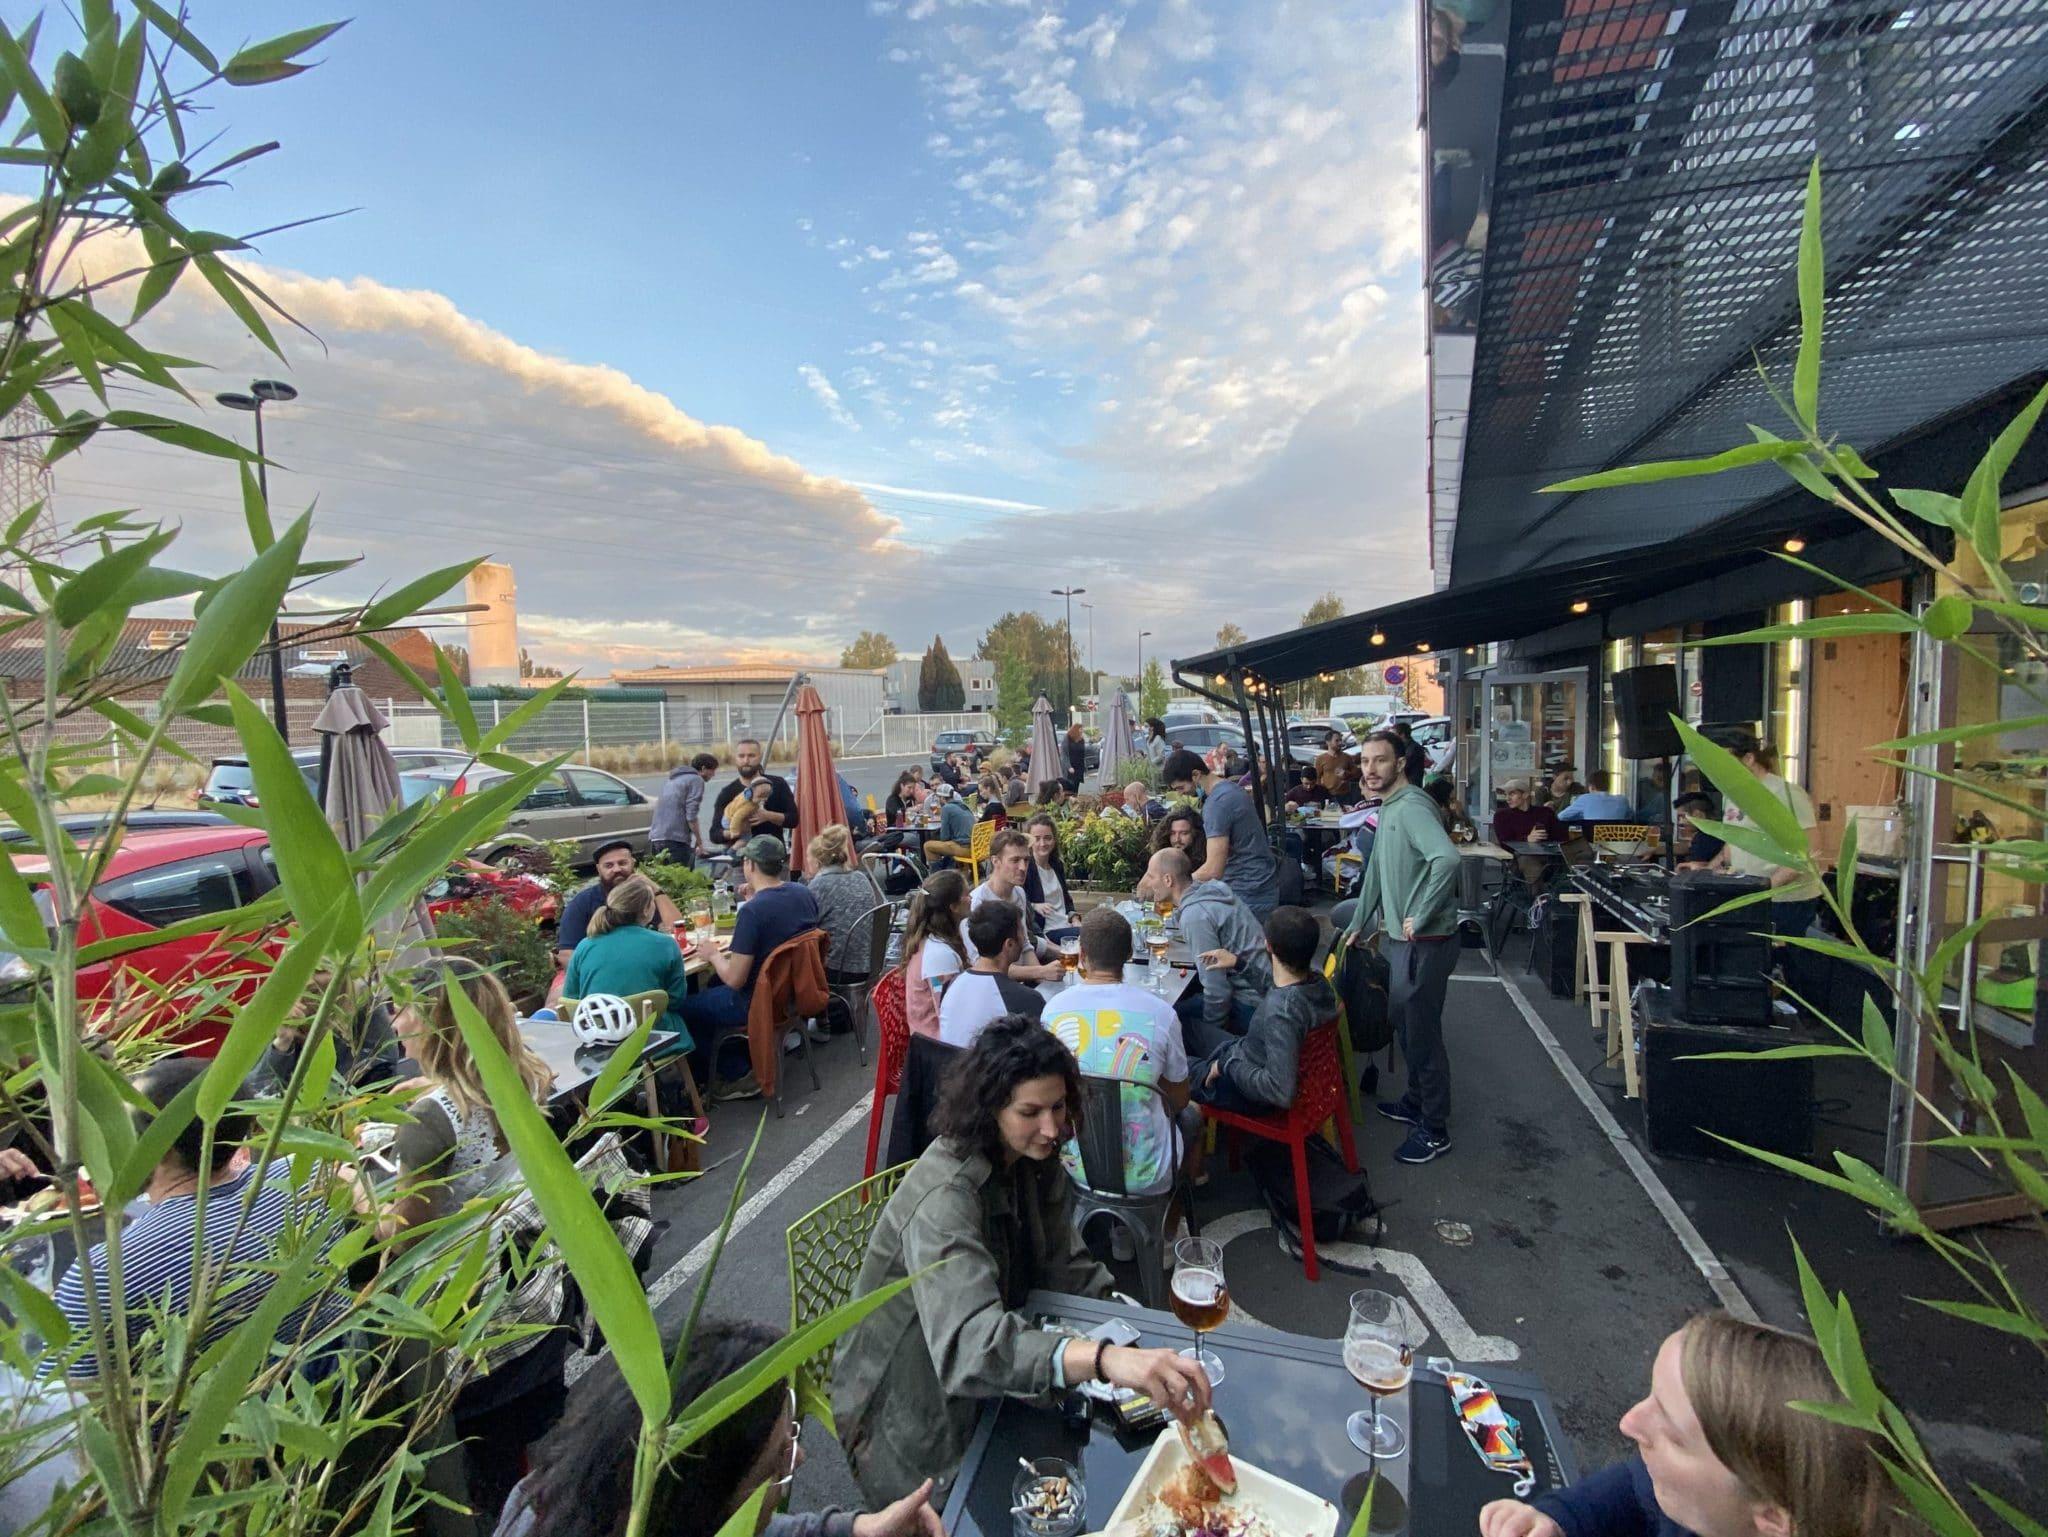 Terrasse restaurant salle d'escalade Vertical'Art Lille